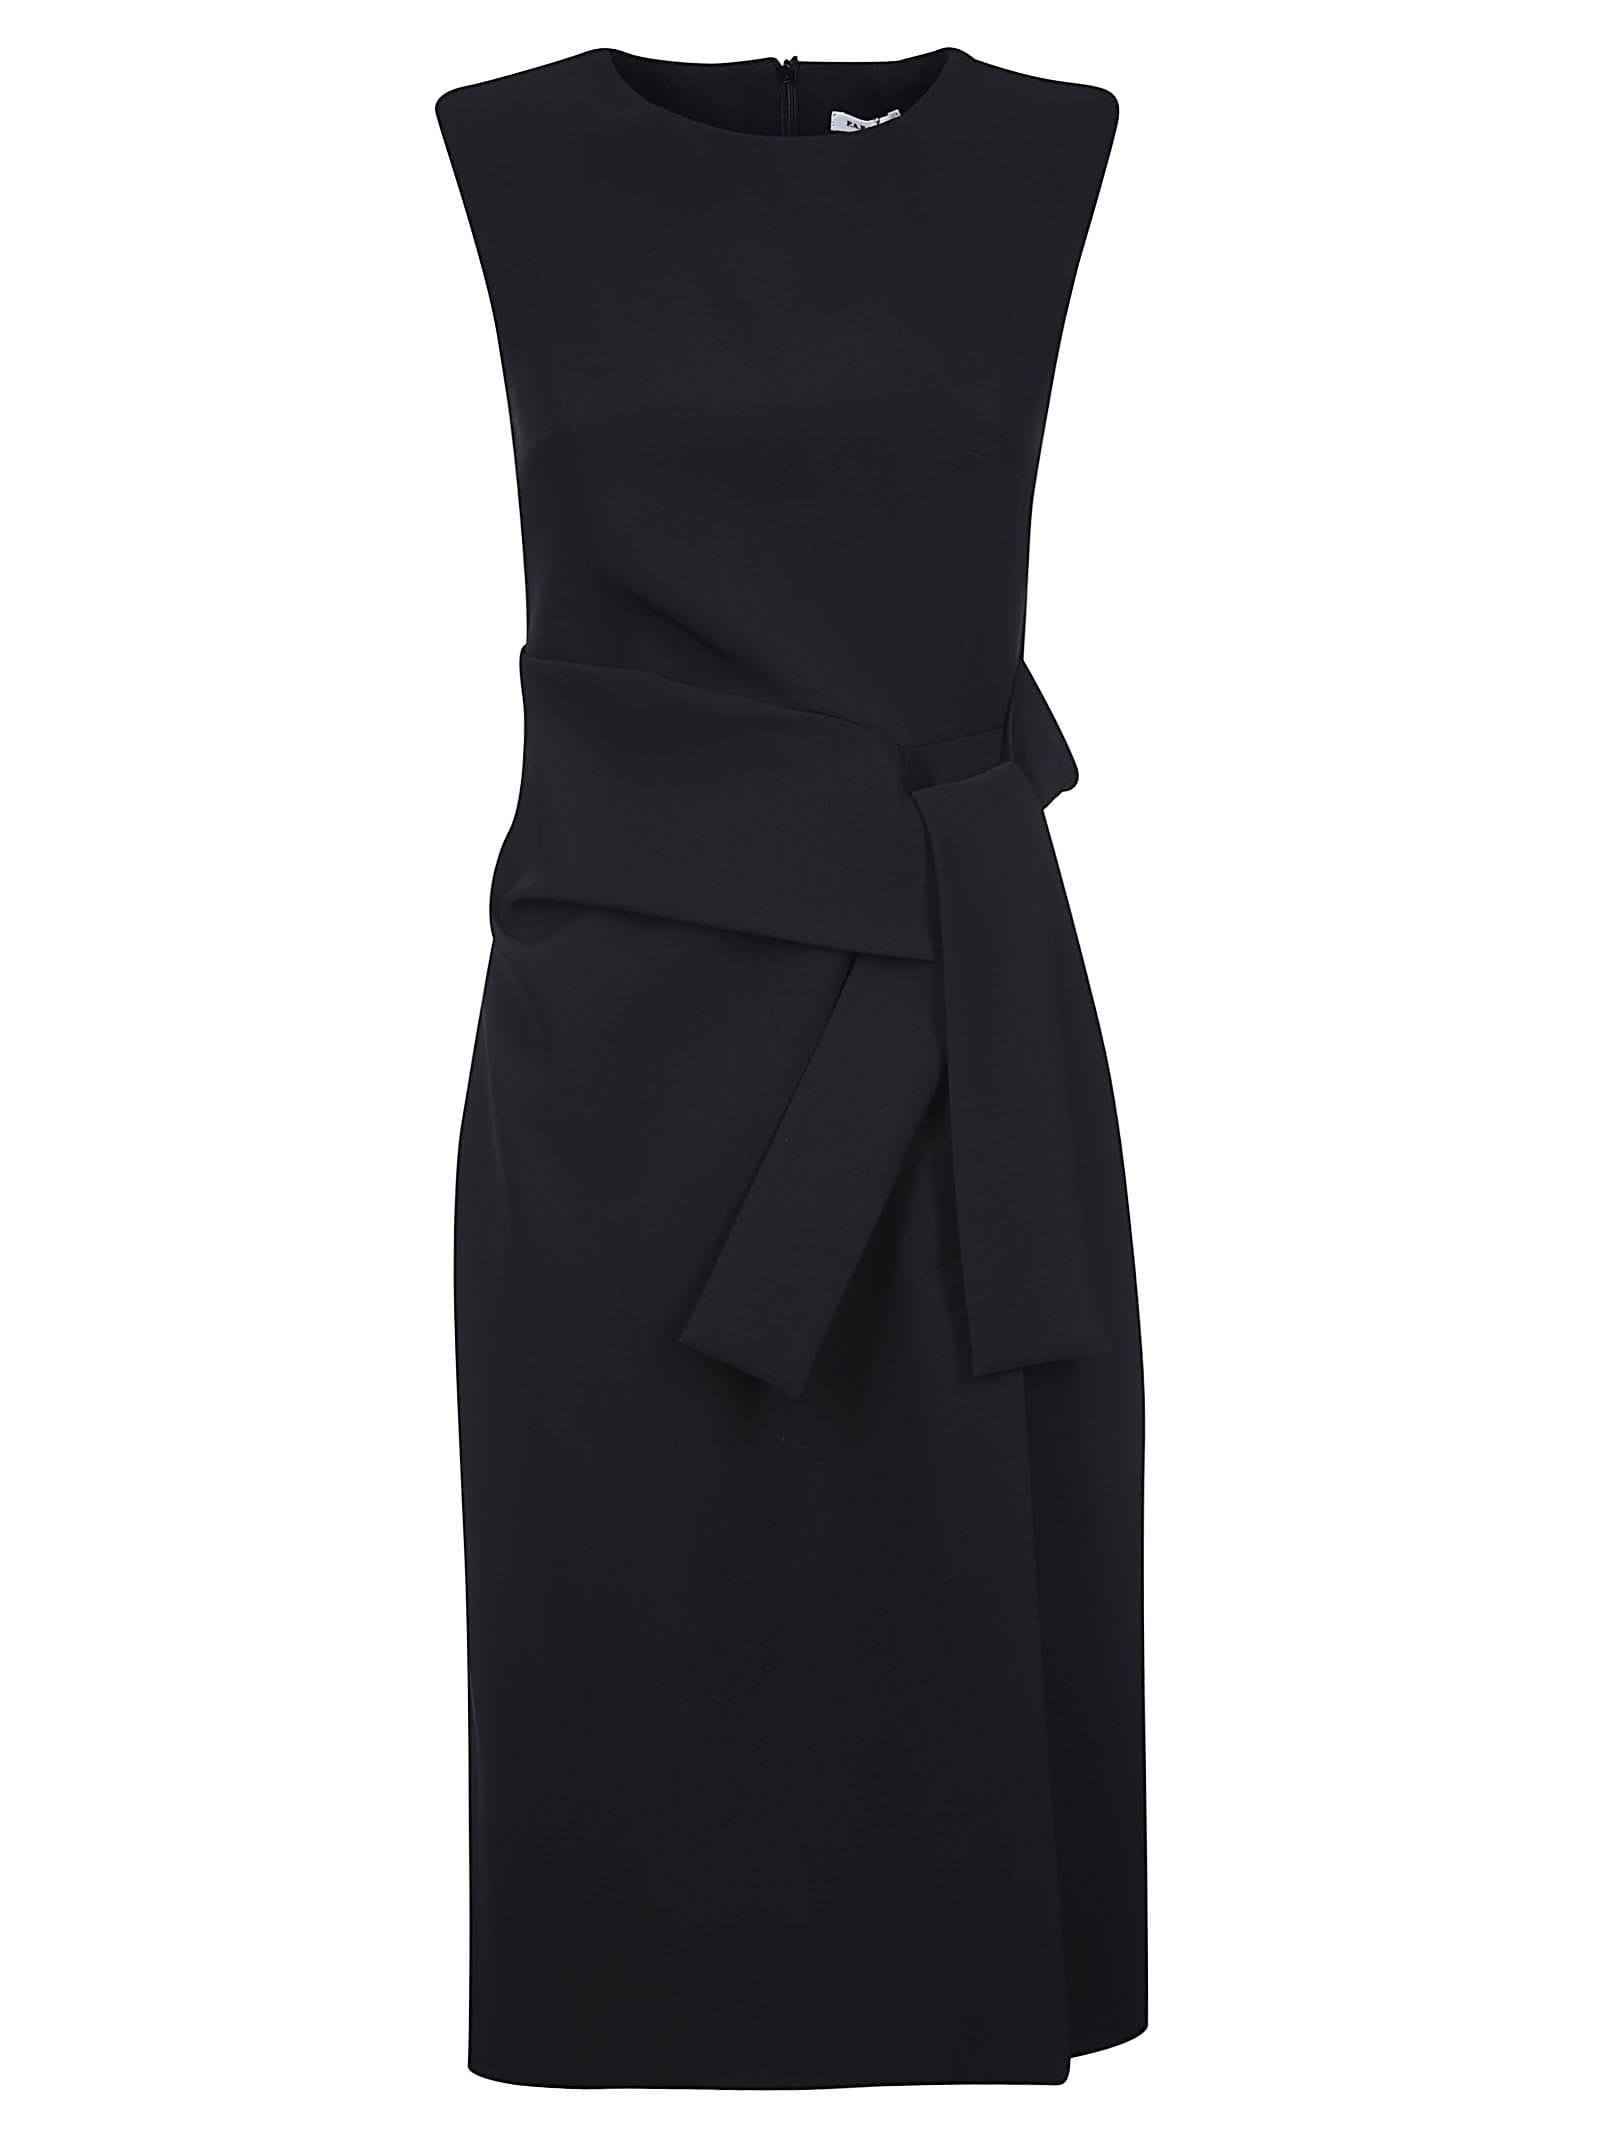 Parosh Sleeveless Dress